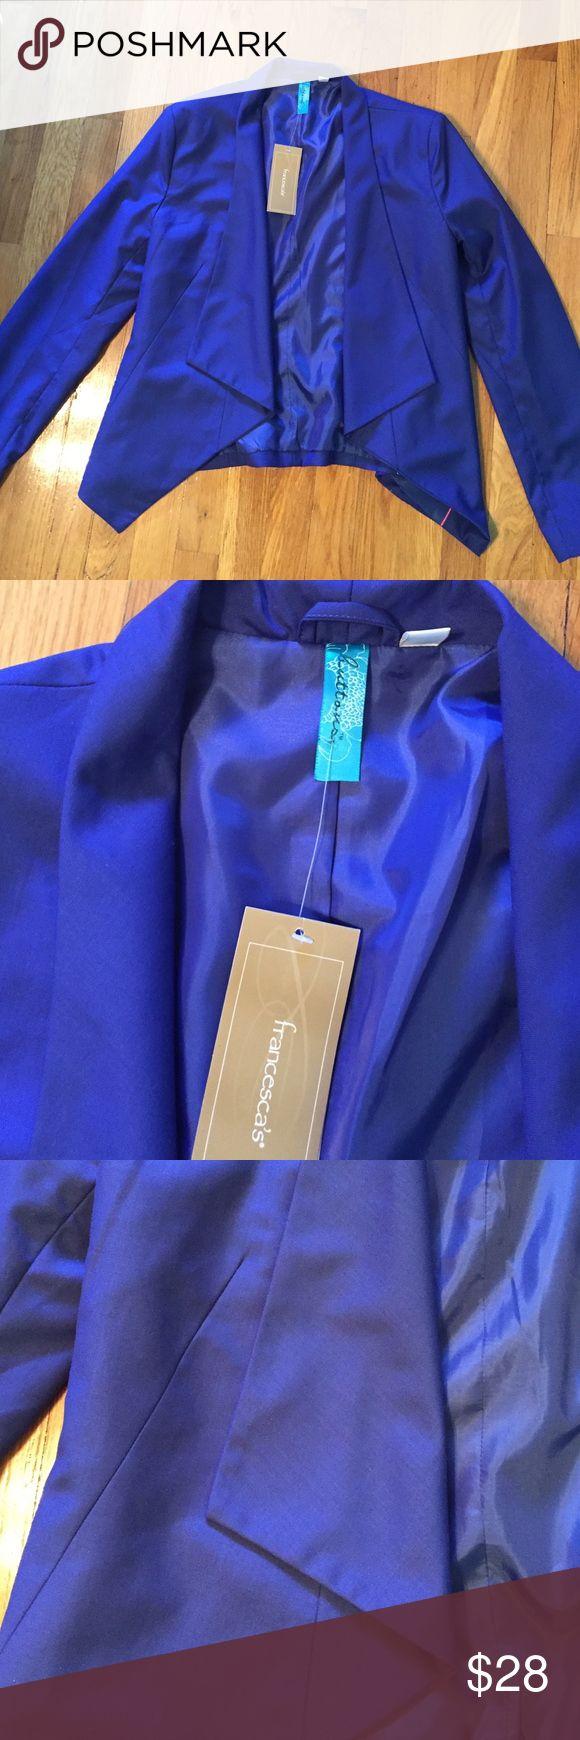 Francesca's classic royal blue blazer! Brand new royal blue blazer from Francesca's! Tickets still on it never worn! Francesca's Collections Jackets & Coats Blazers